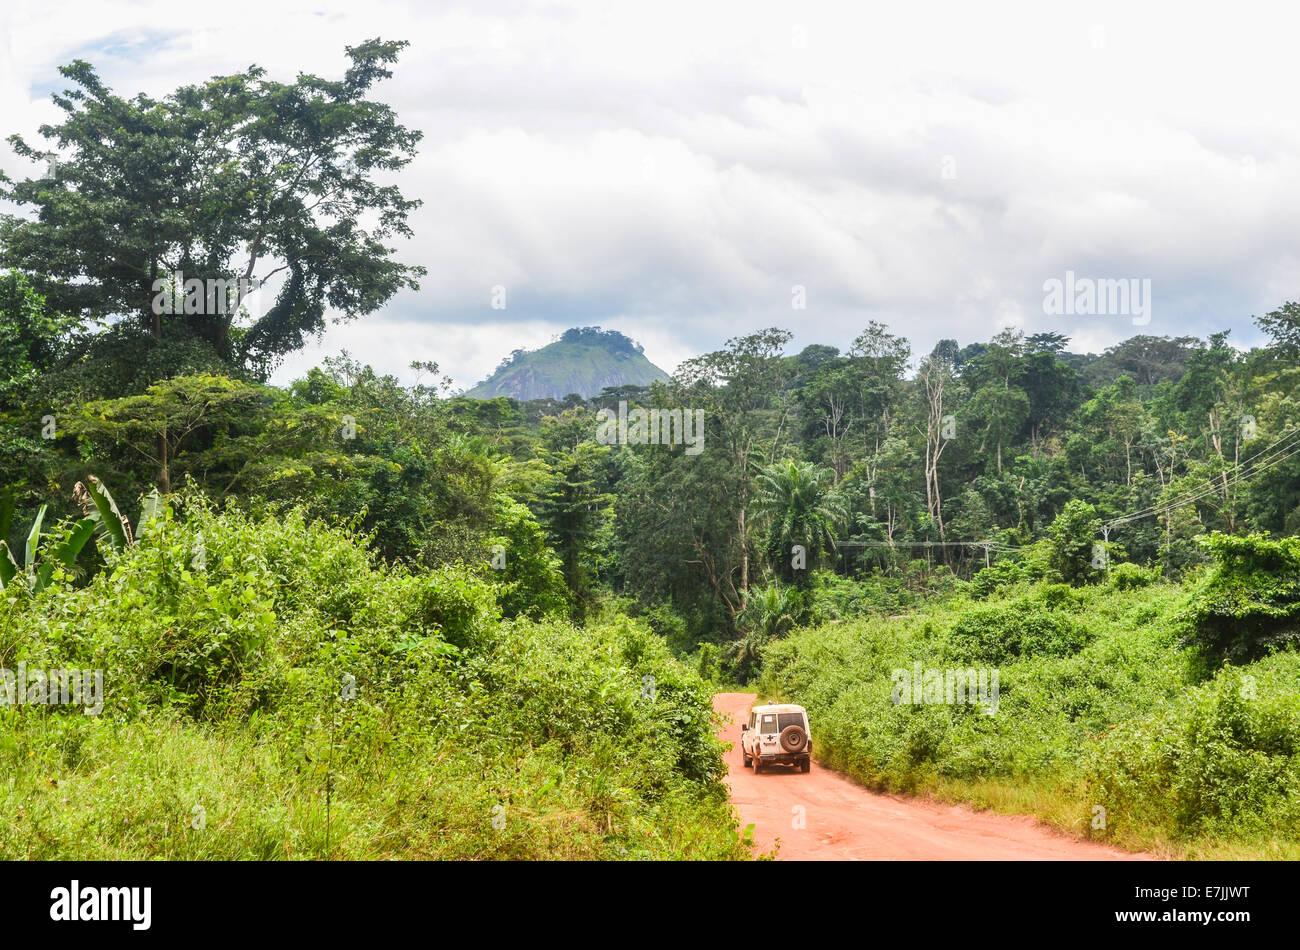 4x4 vehicle on the dirt roads of northern Liberia, Nimba County - Stock Image